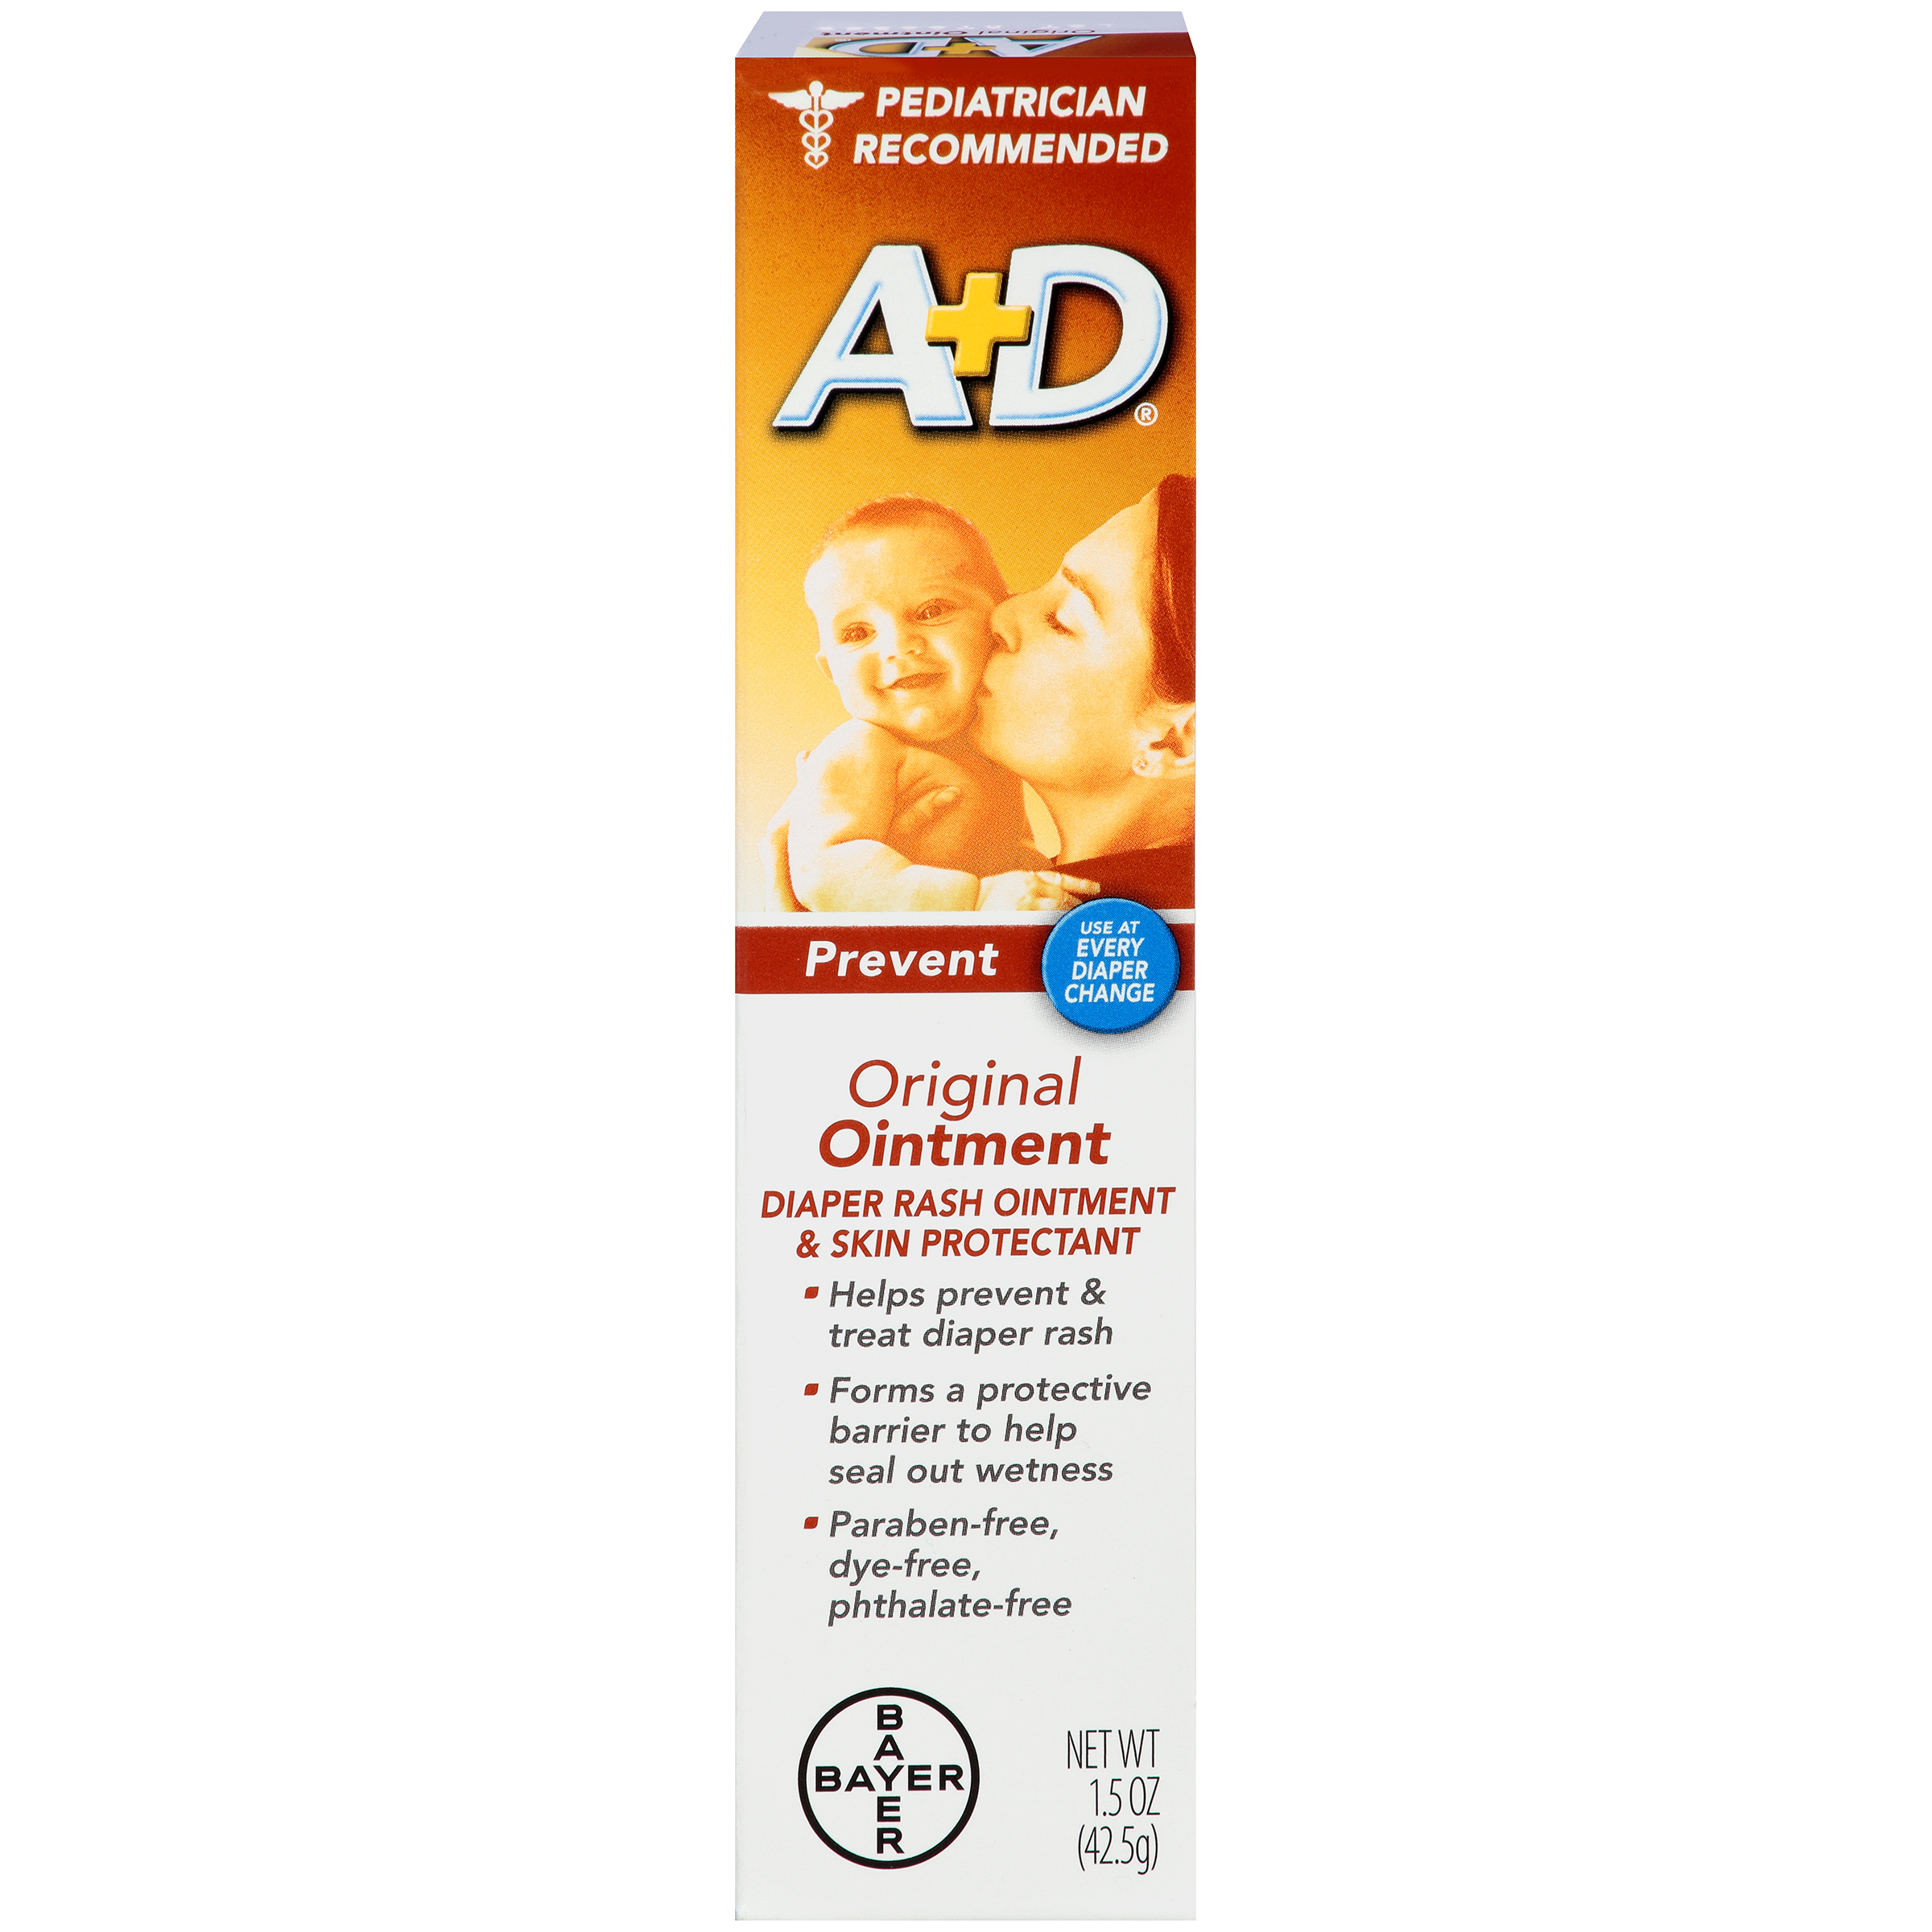 (2 Pack) A+D Original Diaper Rash Ointment, Skin Protectant, 1.5 Ounce Tube